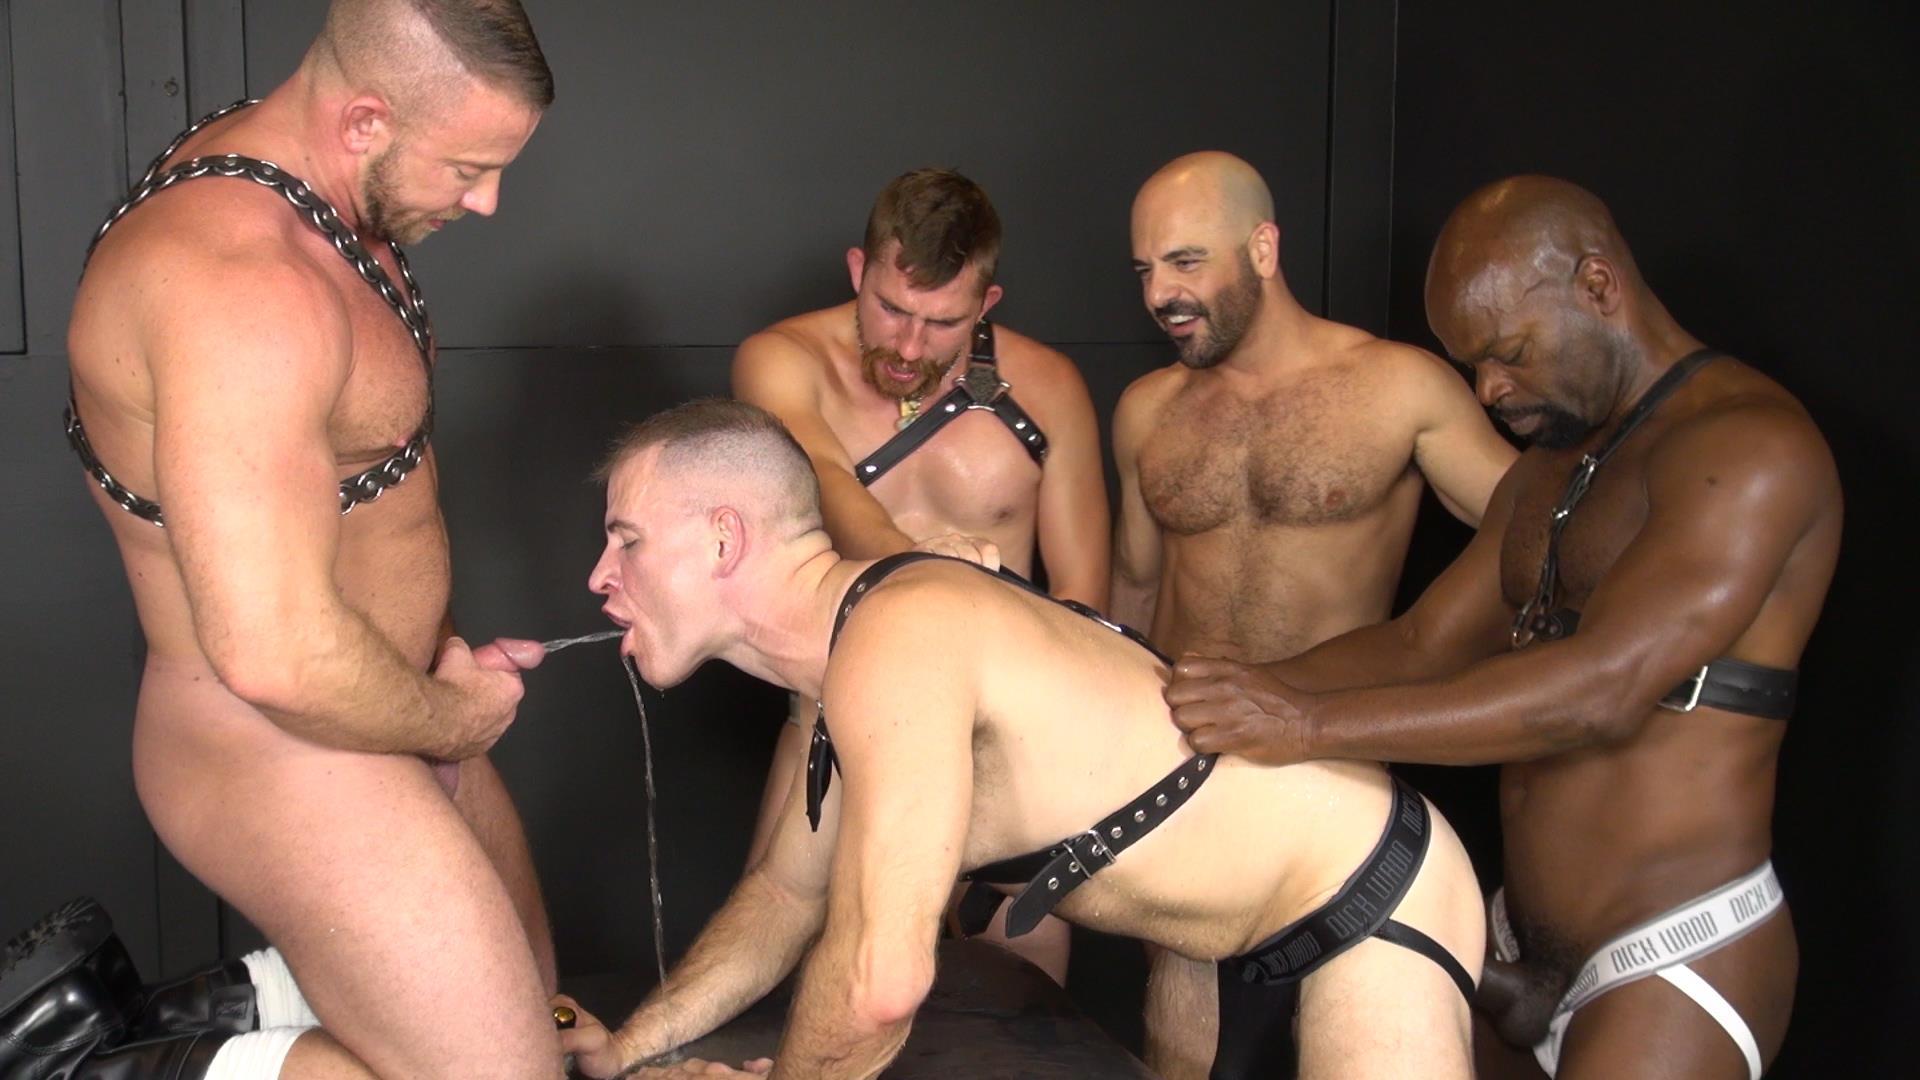 Raw and Rough Ken Byker Dayton OConnor Trelino Shay Michaels Adam Russo Cutler X Interracial Bareback Orgy Amateur Gay Porn 05 Interracial Bareback Orgy With Adam Russo & Cutler X